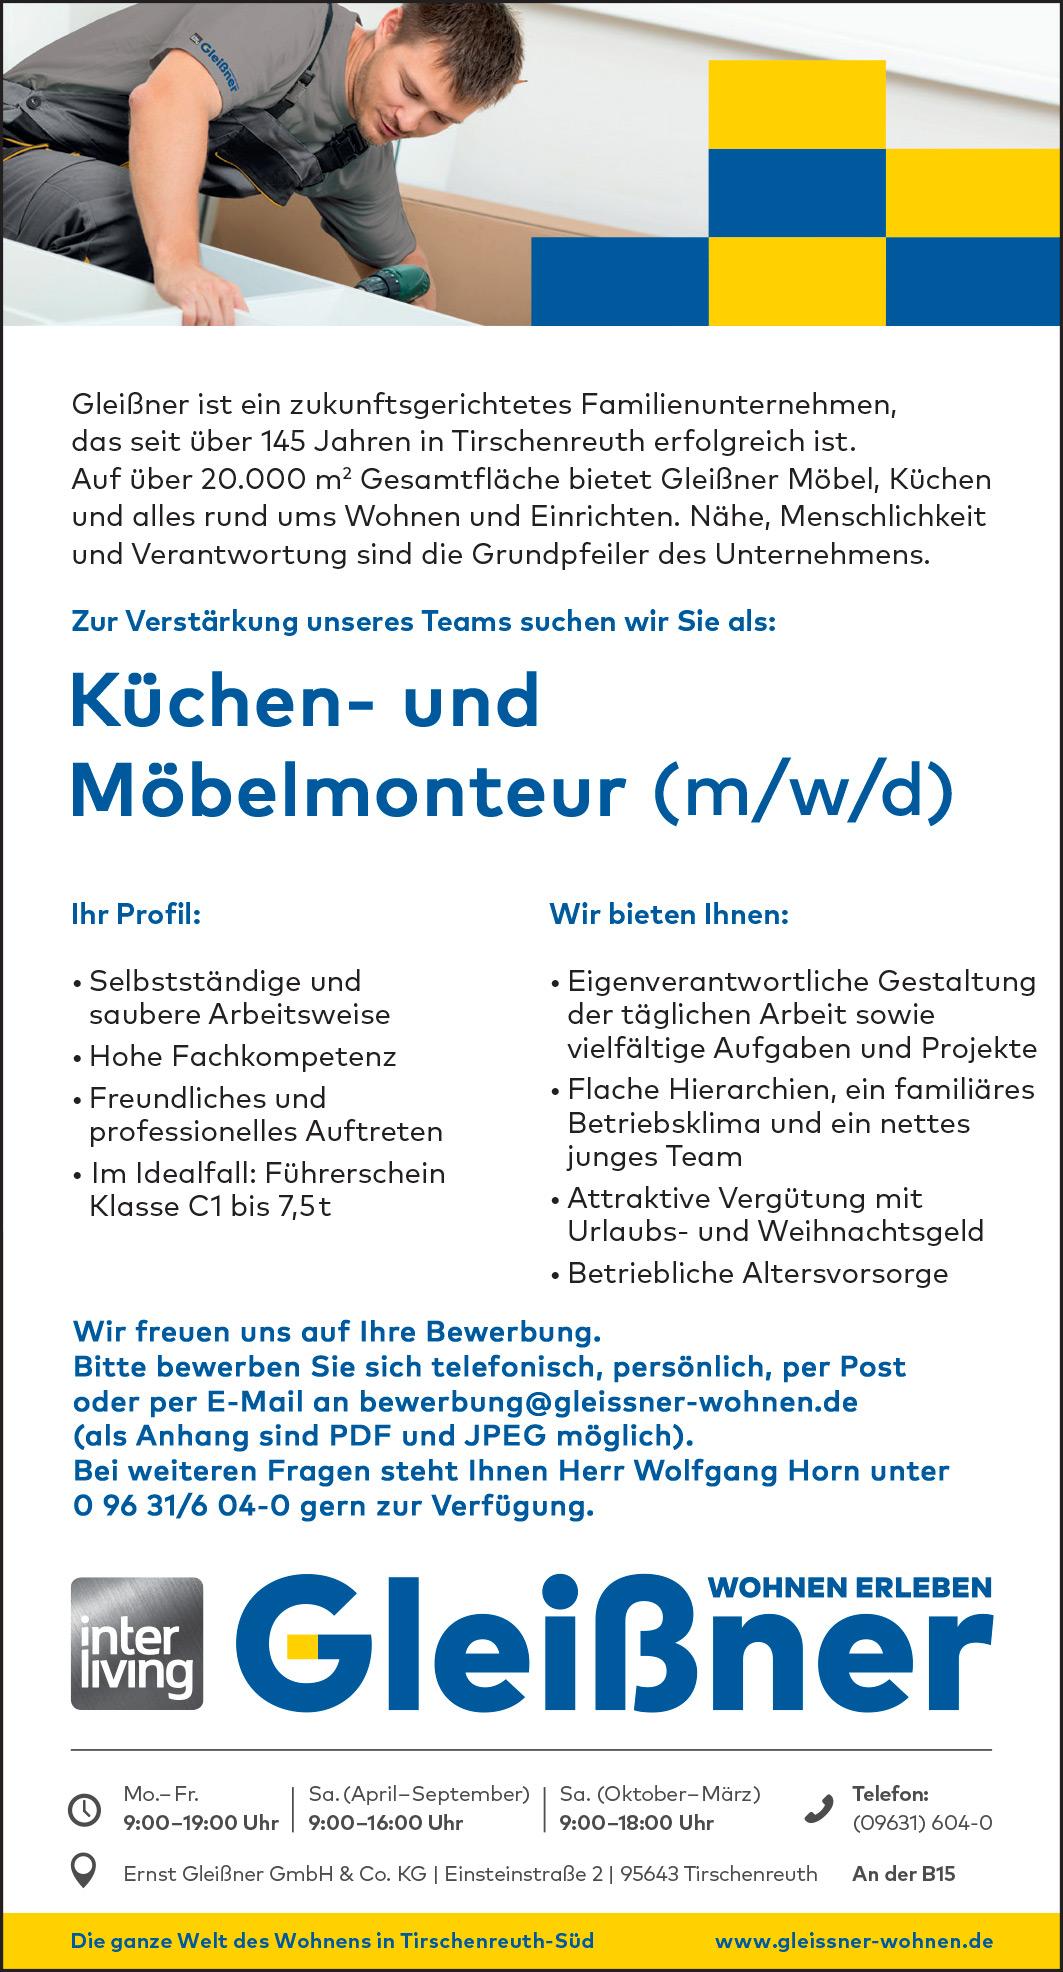 Gl_Stellenanzeige_Kuechen_Moebelmonteur-2020